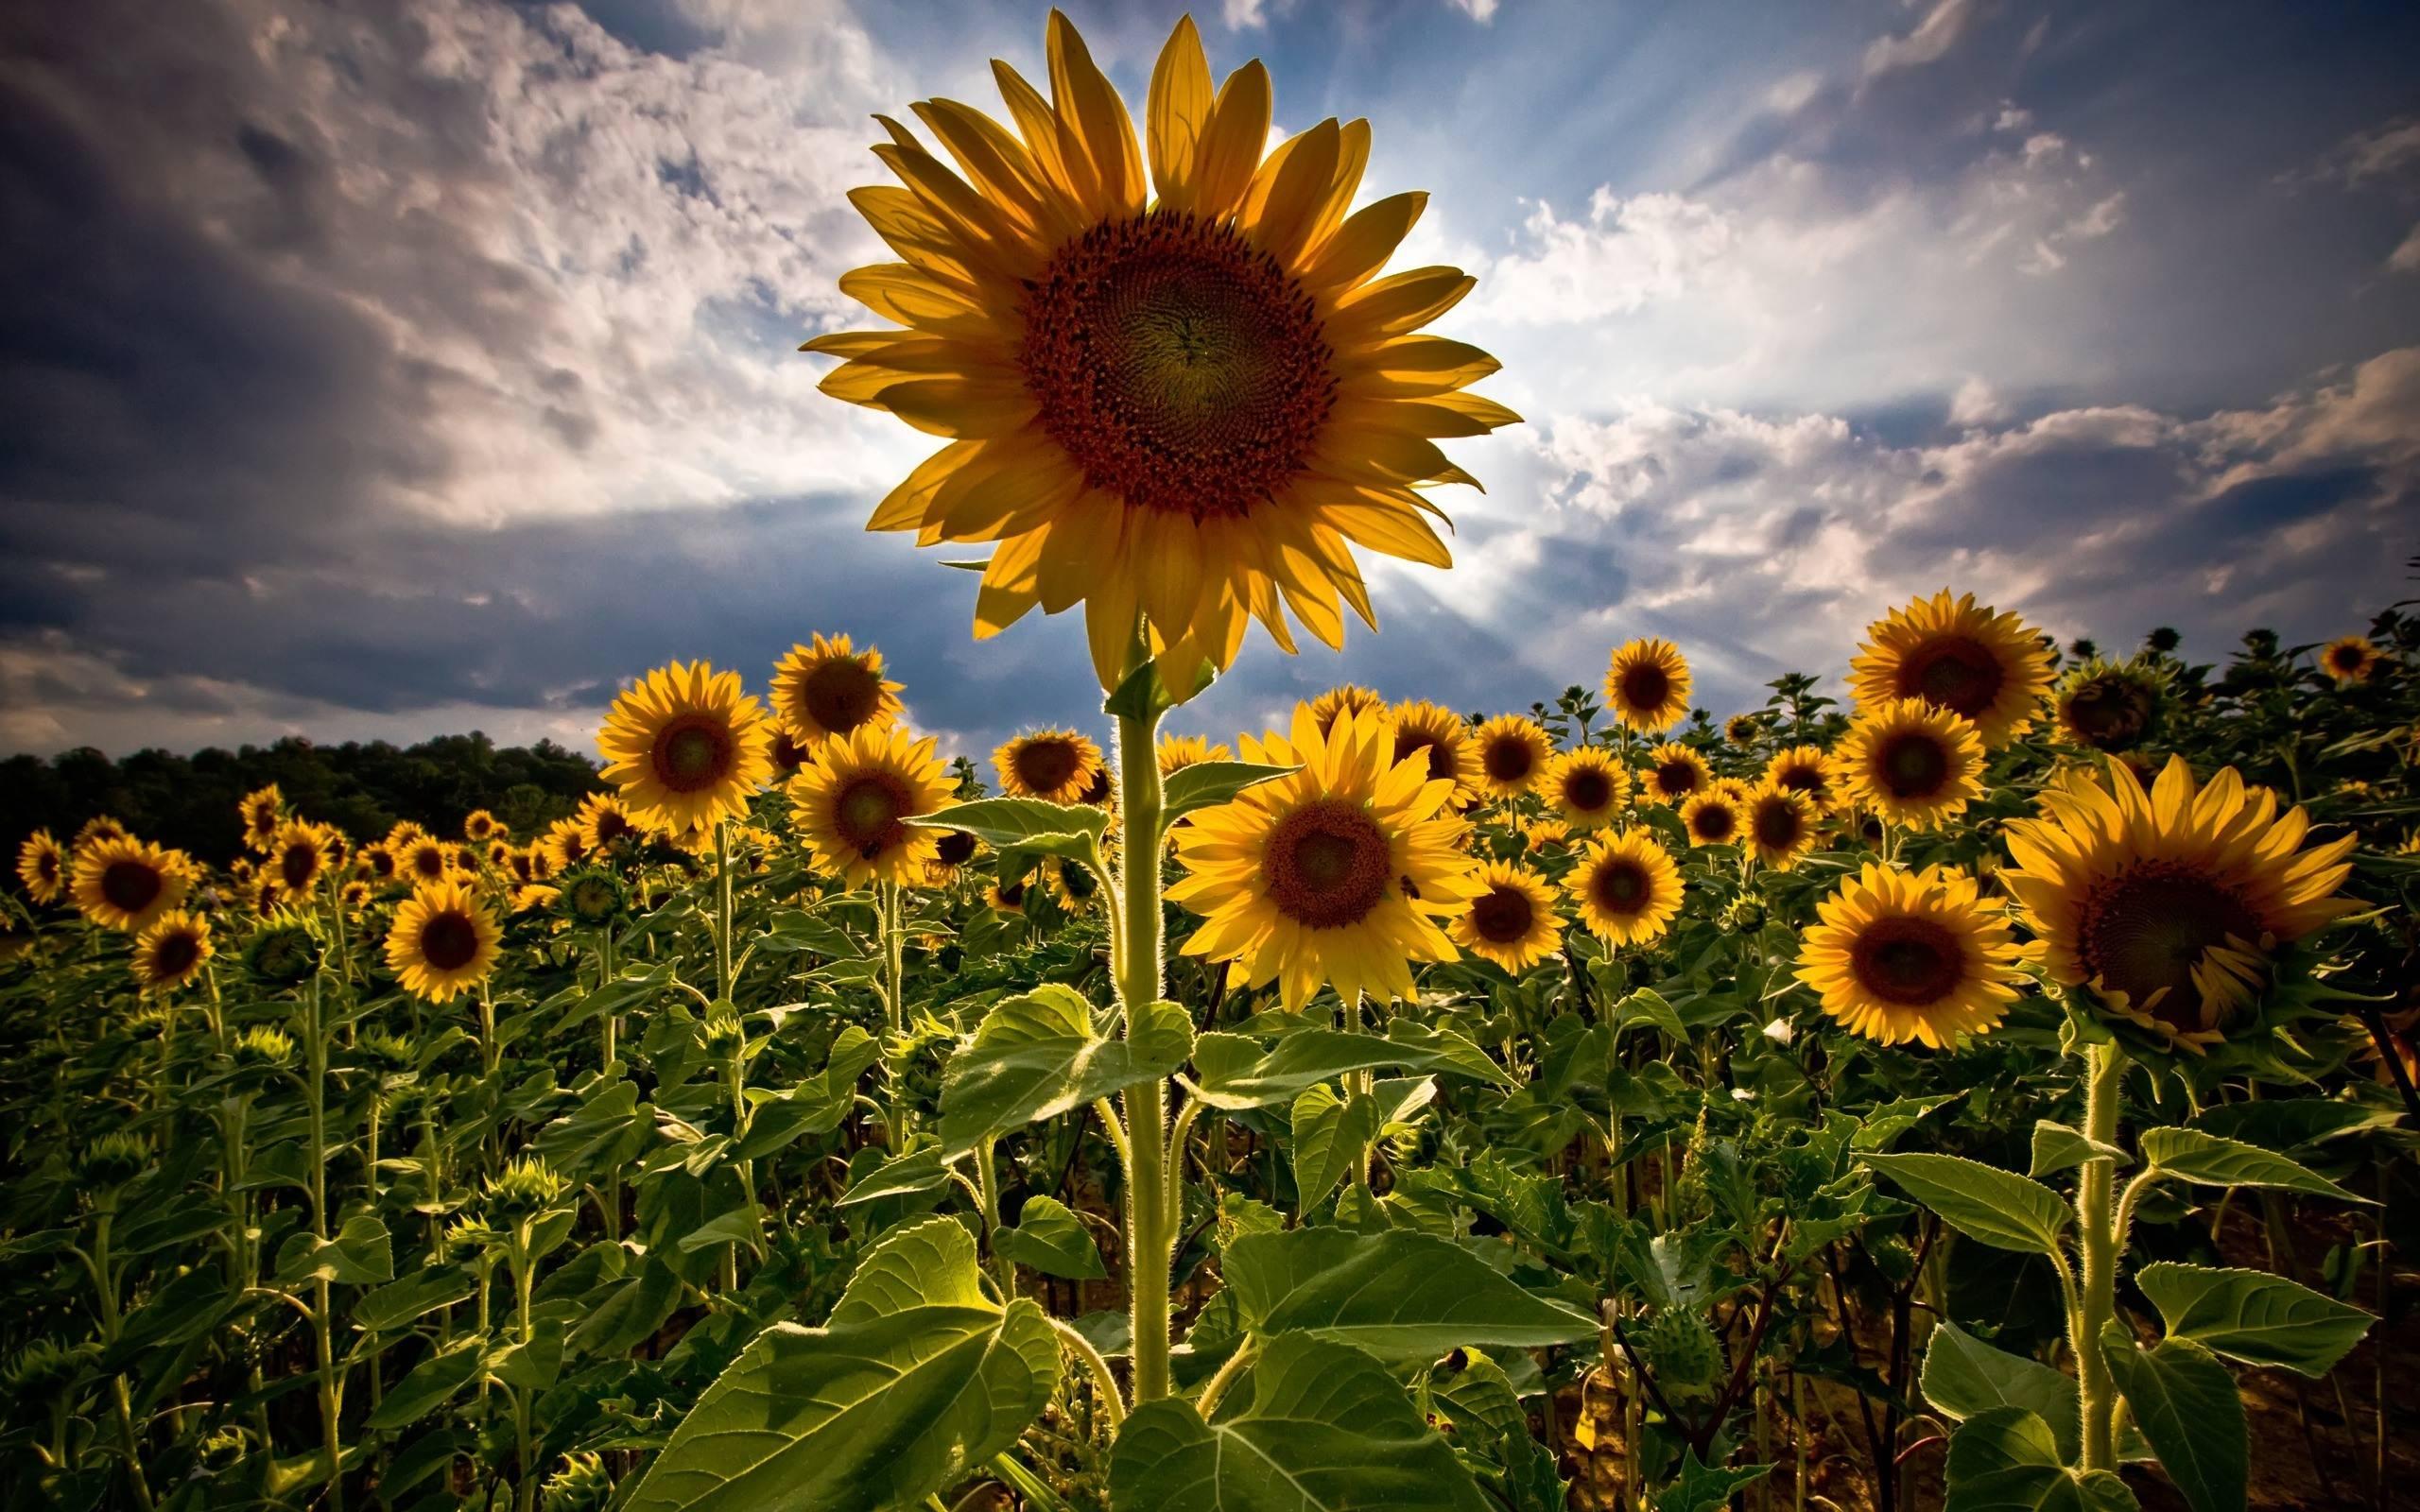 Sunflower Background Cool Hd Wallpaper For Desktop 24300